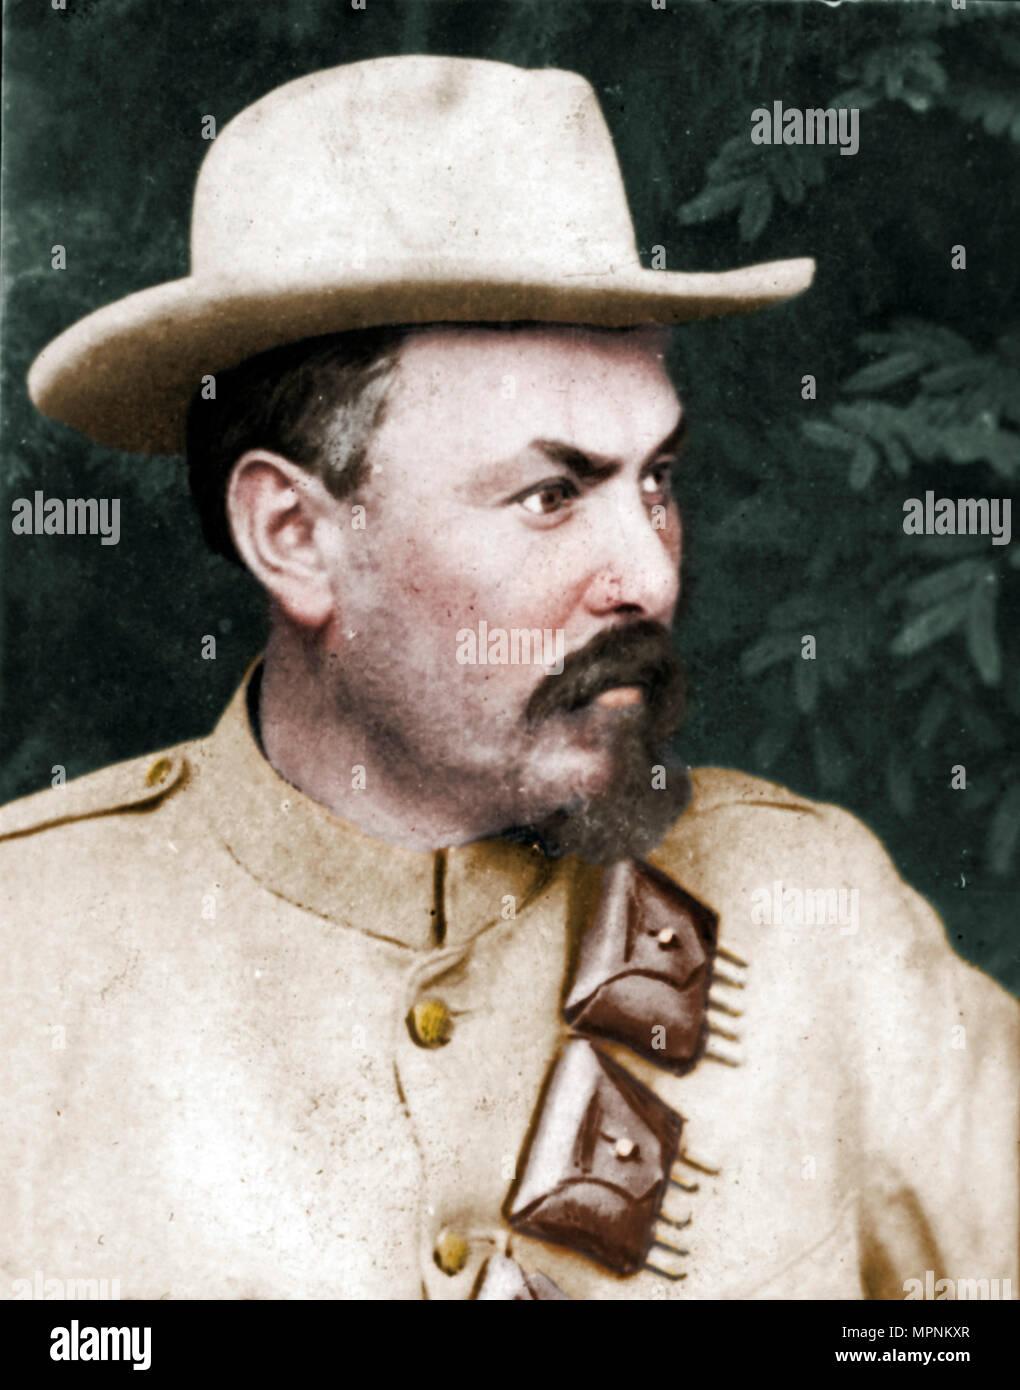 'General Louis Botha', (1862-1919), Afrikaner soldier and statesman, 1894-1907. Artist: Unknown. - Stock Image